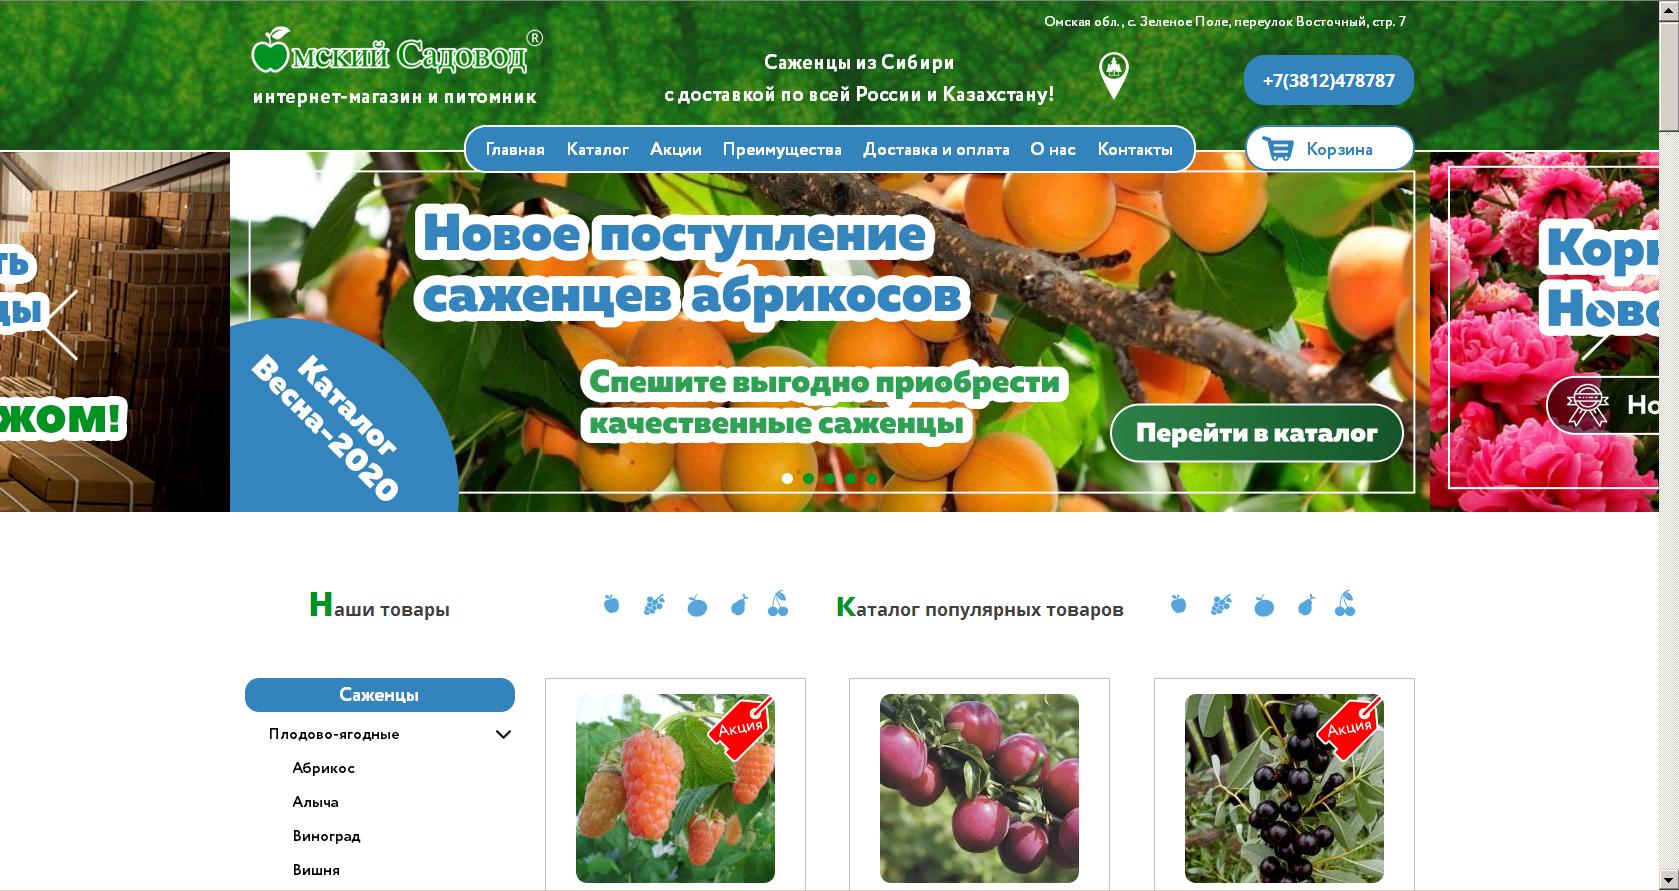 Скриншот интернет-магазина omsksadovod.ru